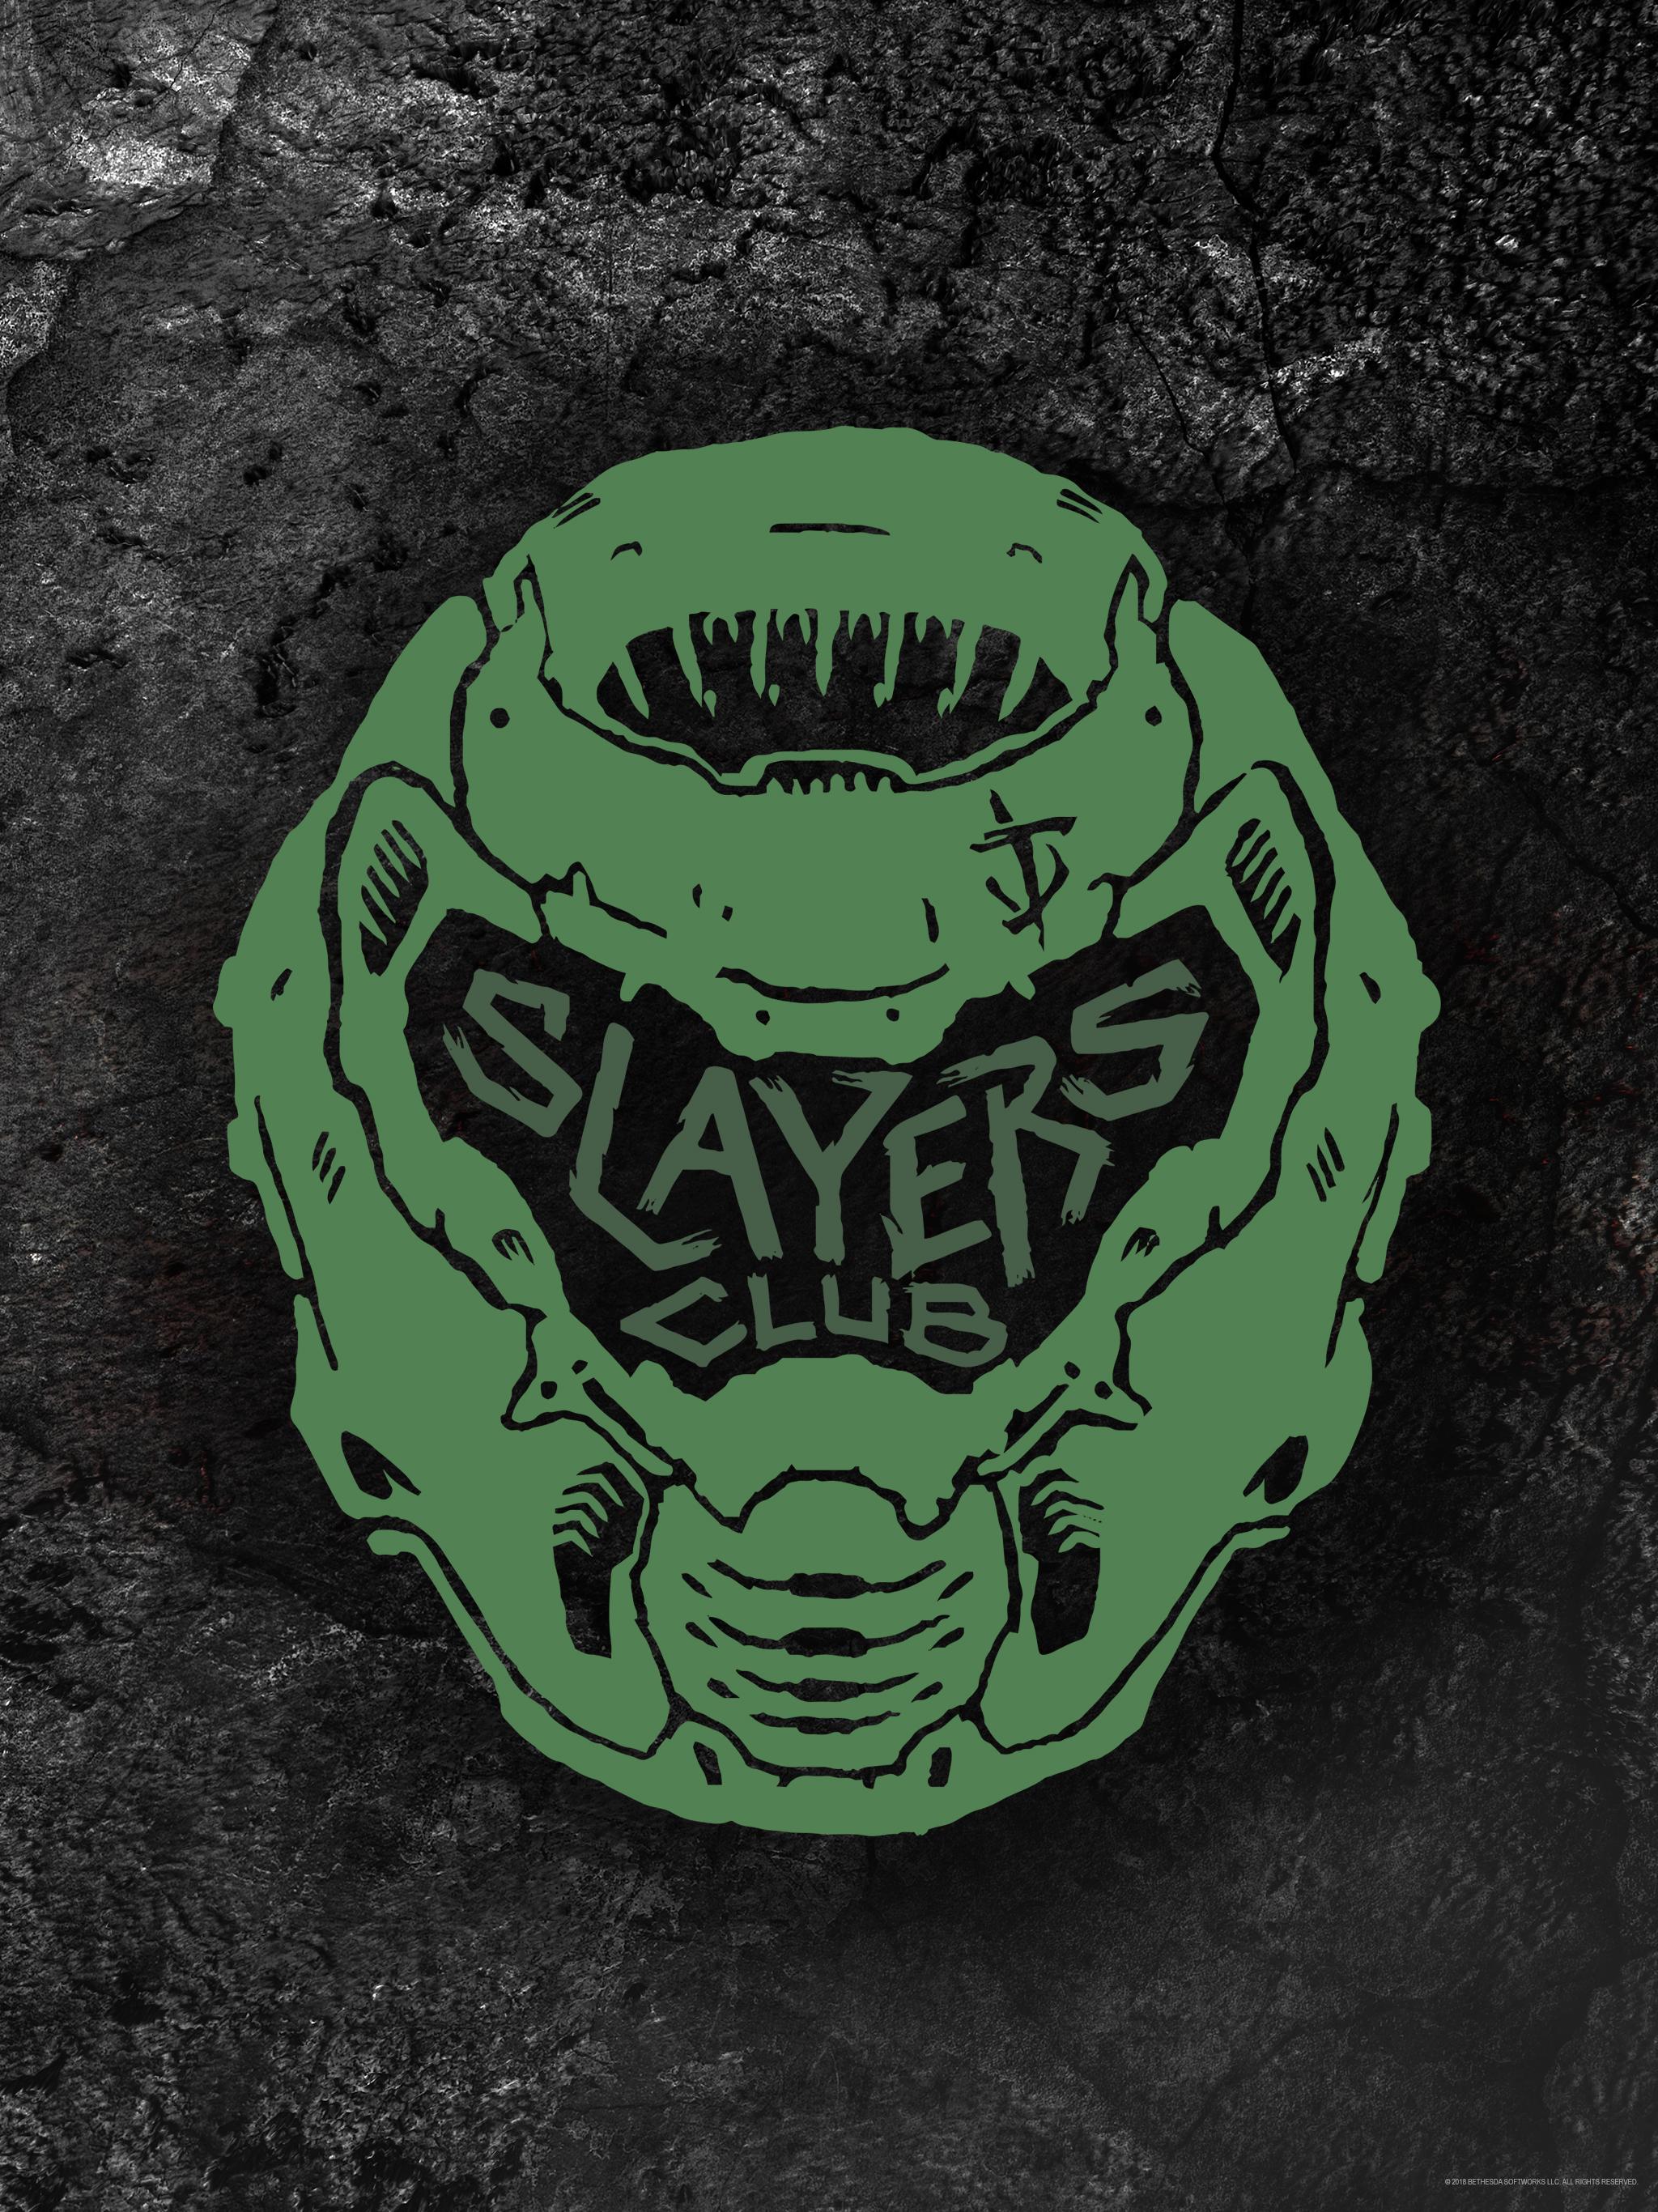 Home | Slayers Club | DOOM Eternal | Bethesda net